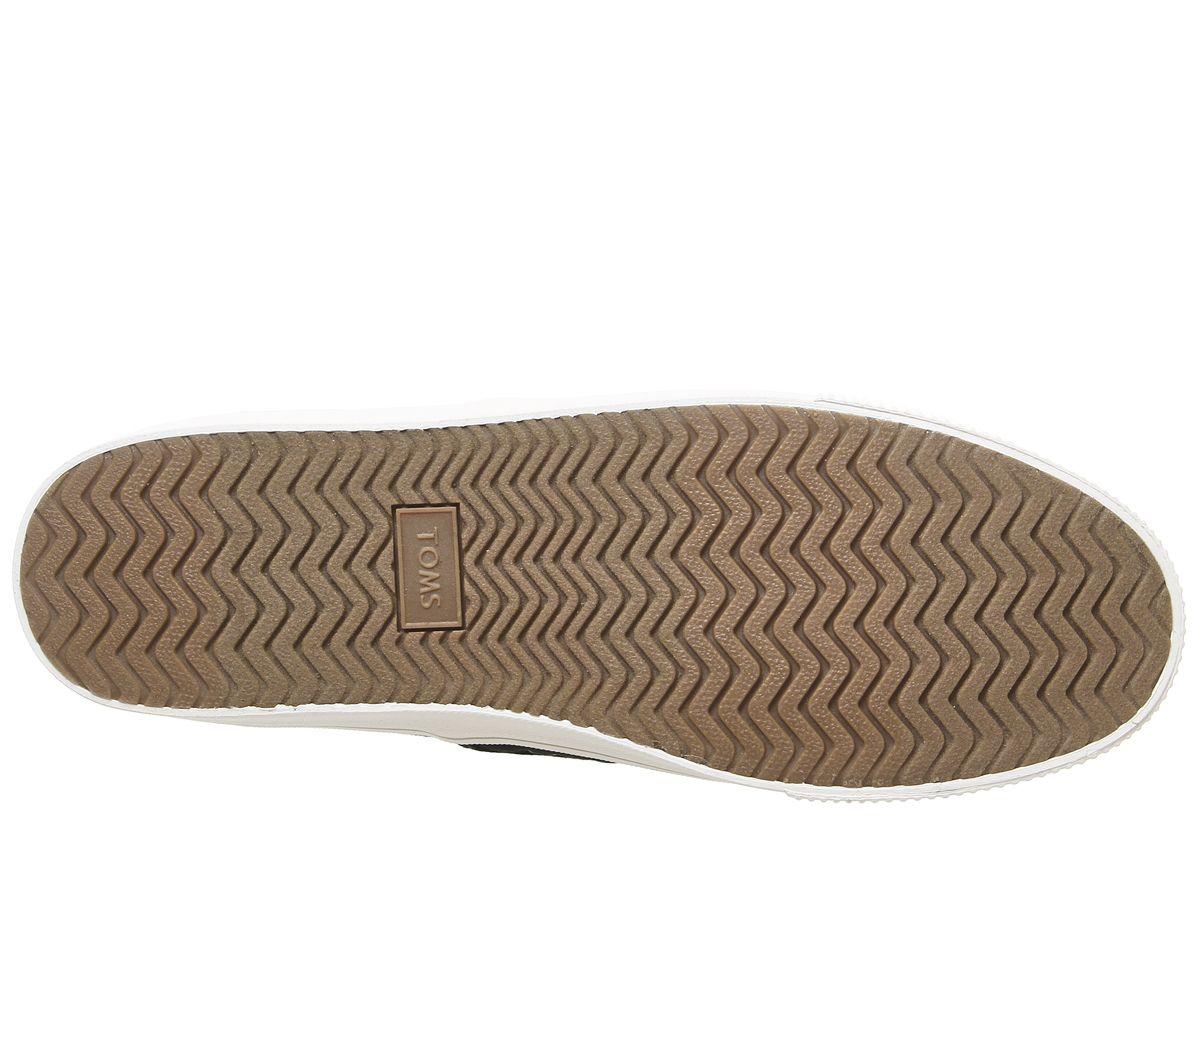 Da-Uomo-Toms-Baja-SLIP-ONS-Black-suola-bianca-scarpe-casual miniatura 6